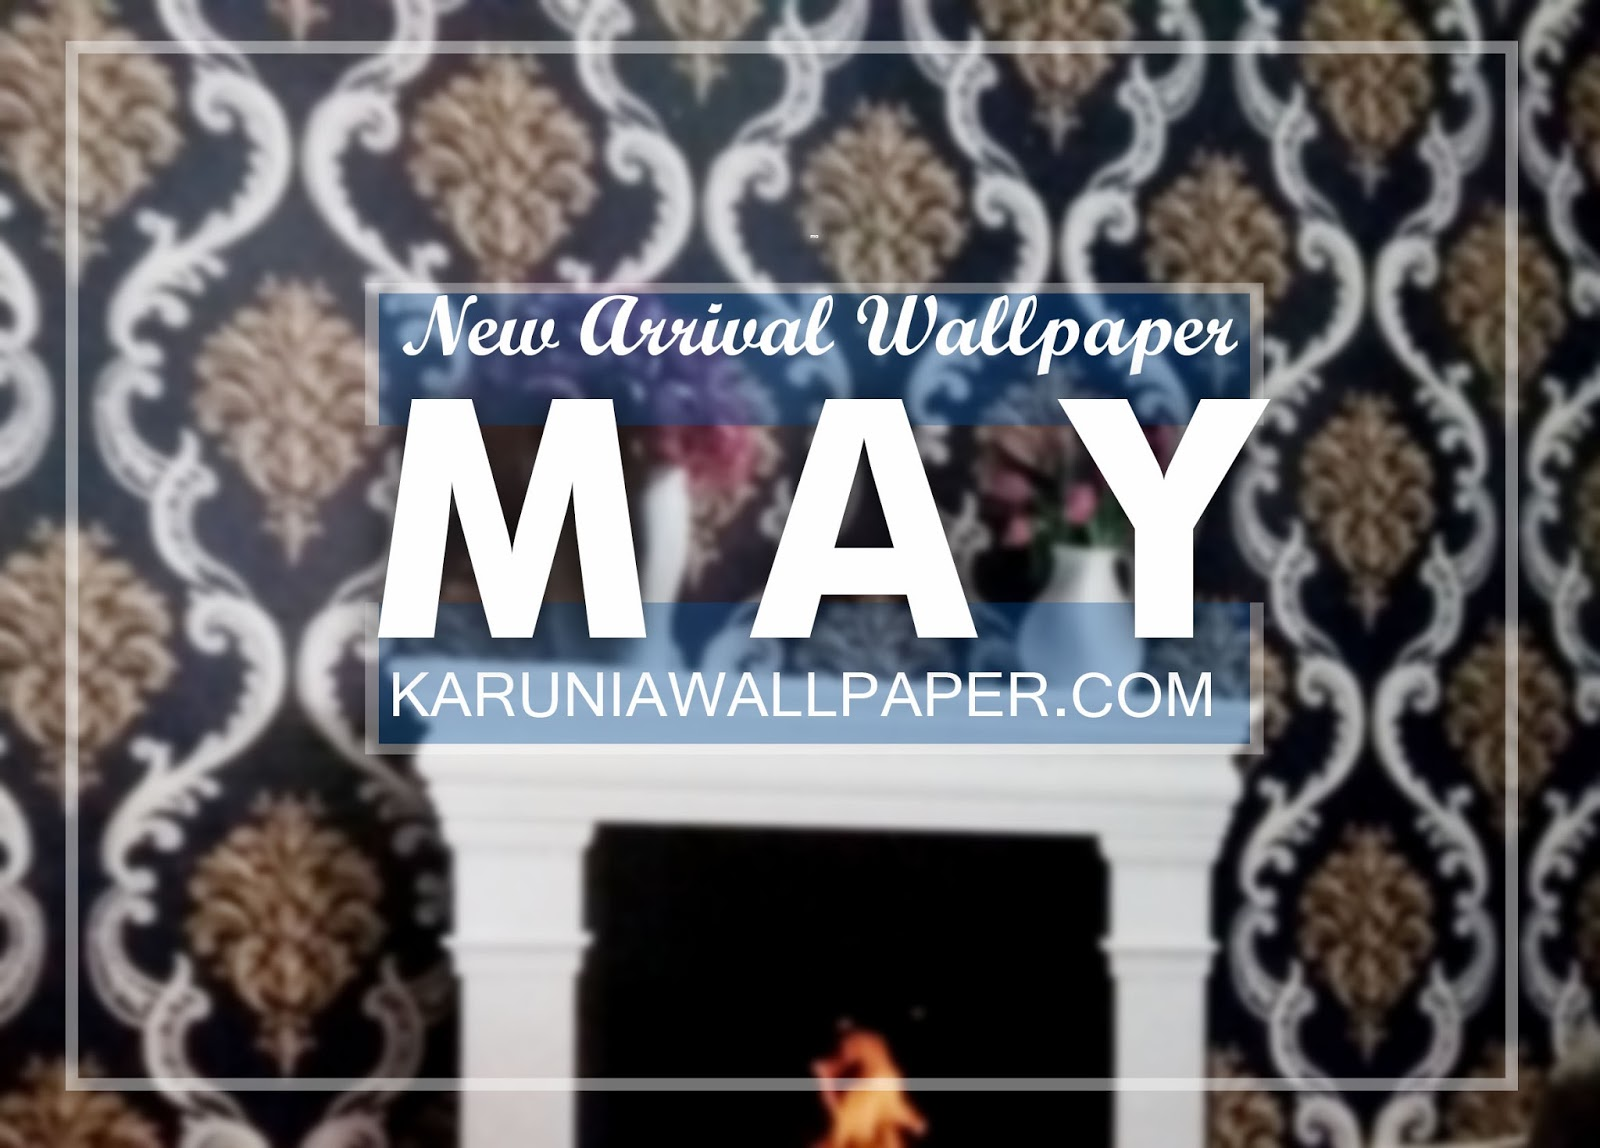 wallpaper terbaru surabaaya